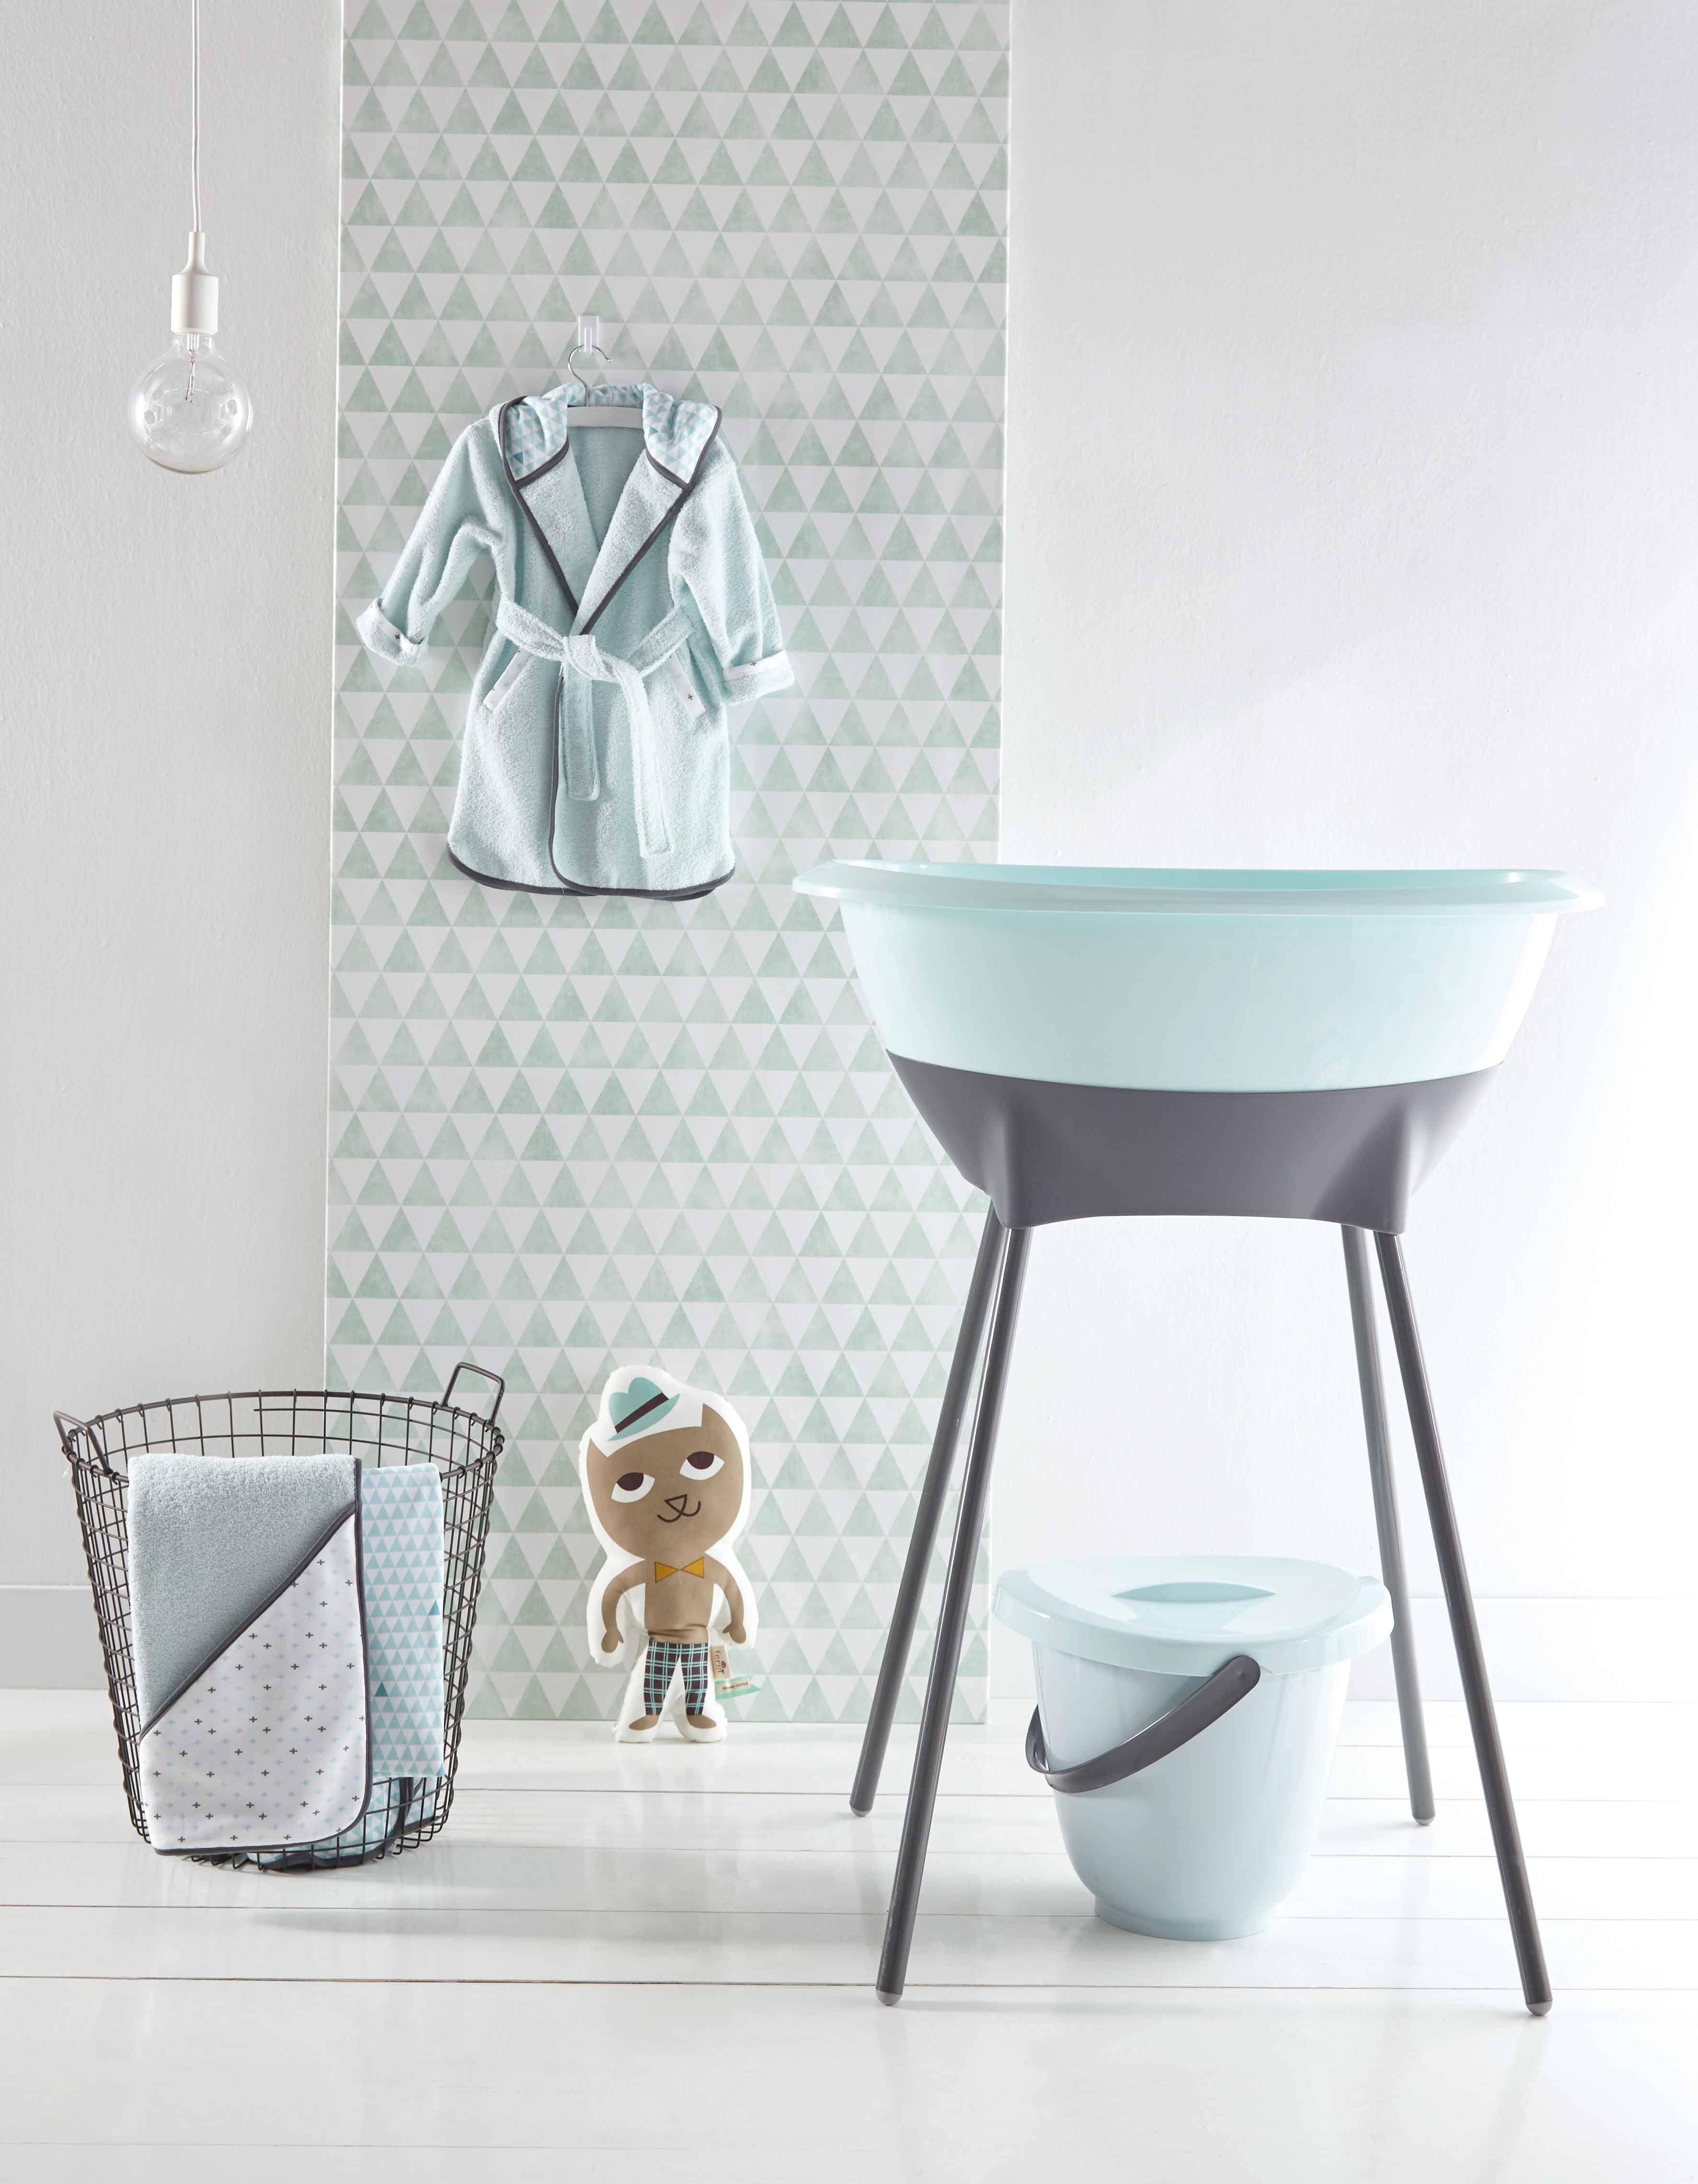 Luma Misty Mint Collection Baby Design Baby Bath Tub Baby Furniture Luma